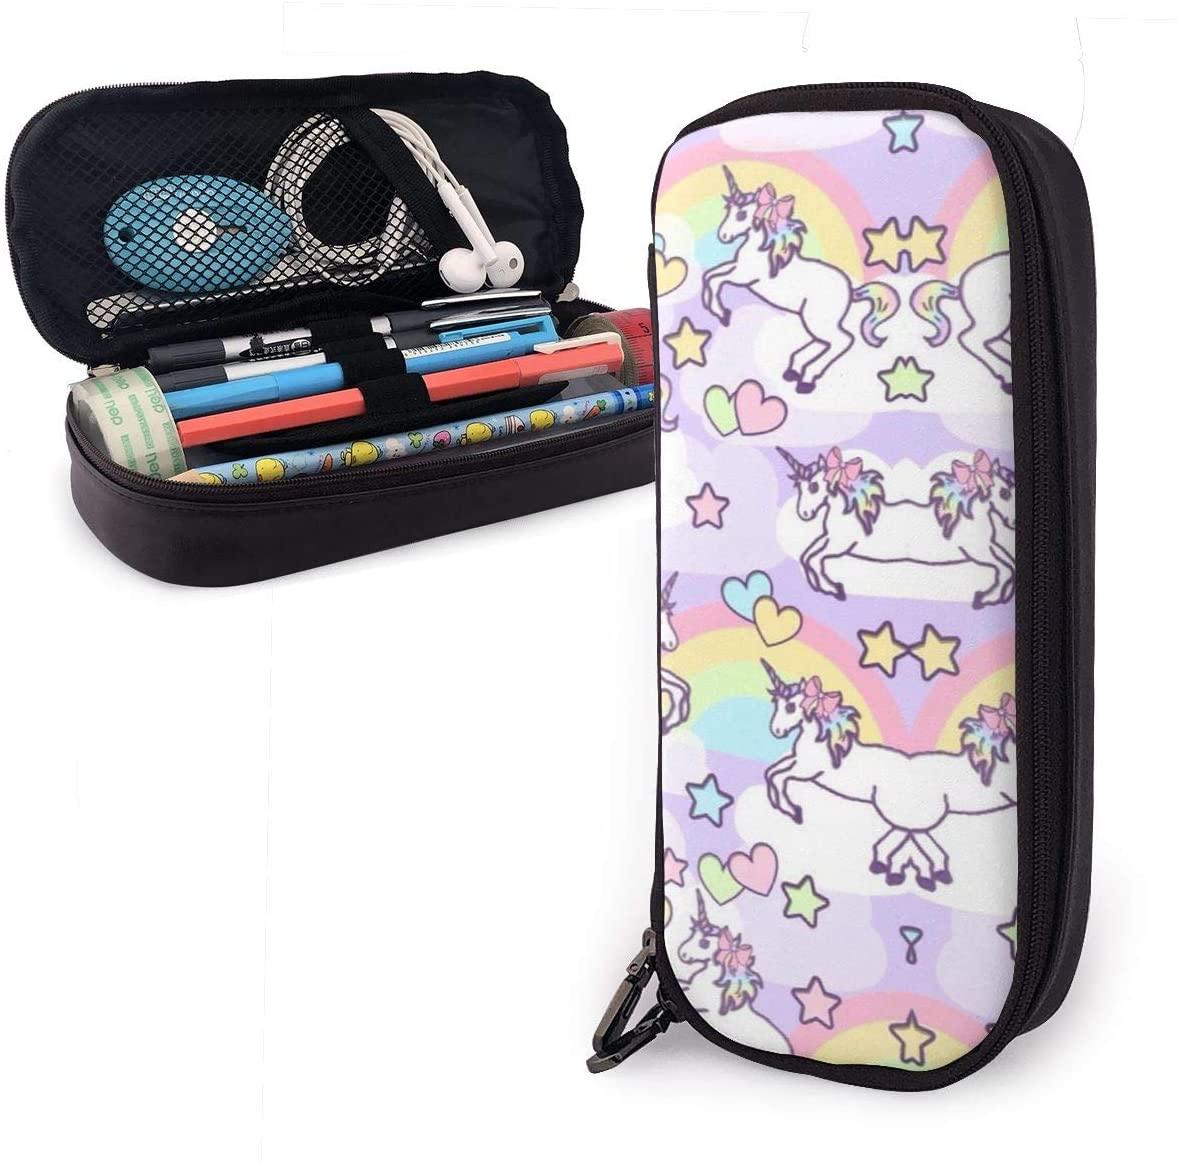 XUJ YOGA Big Capacity Pencil Case Bag Pen Pouch Holder Large Storage Stationery Organizer for School Supplies Office College (Rainbow Unicorn Heart)